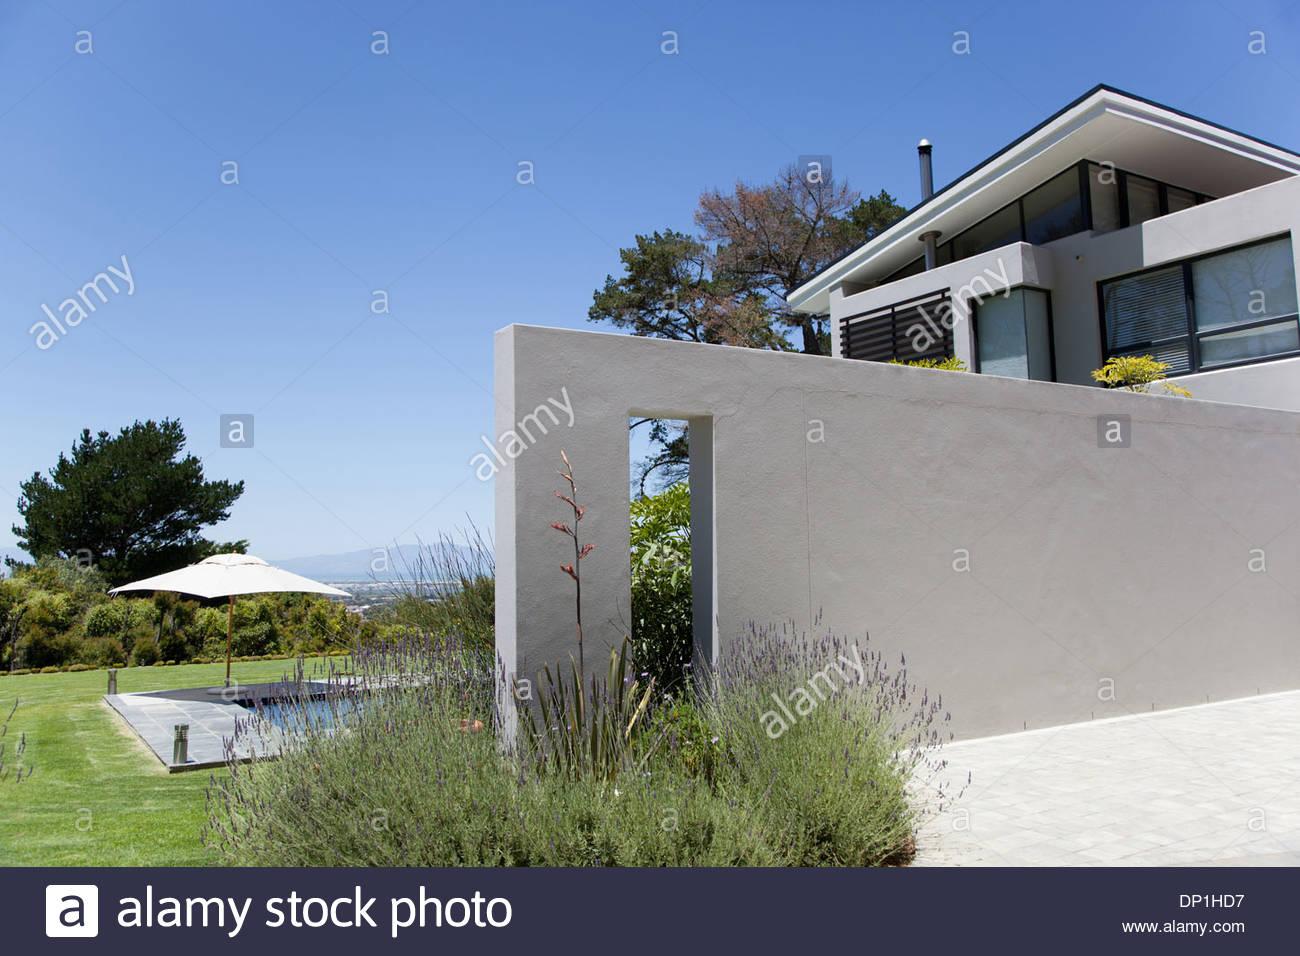 Muro exterior de la casa moderna Imagen De Stock